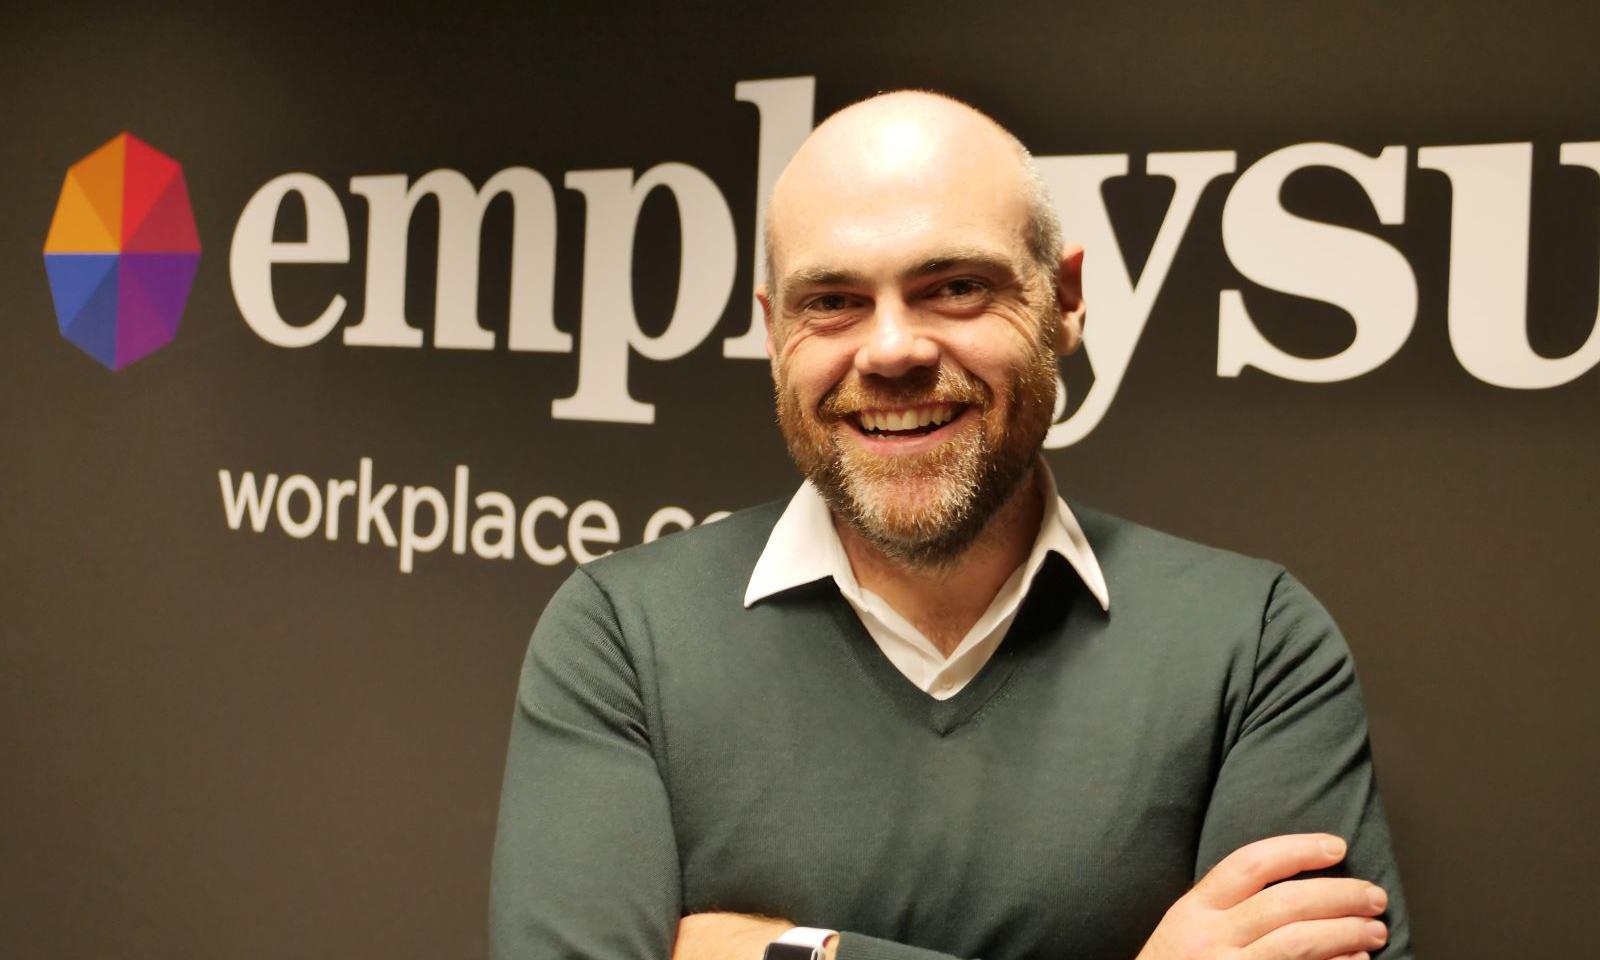 Michael Morris, Employsure (AU)